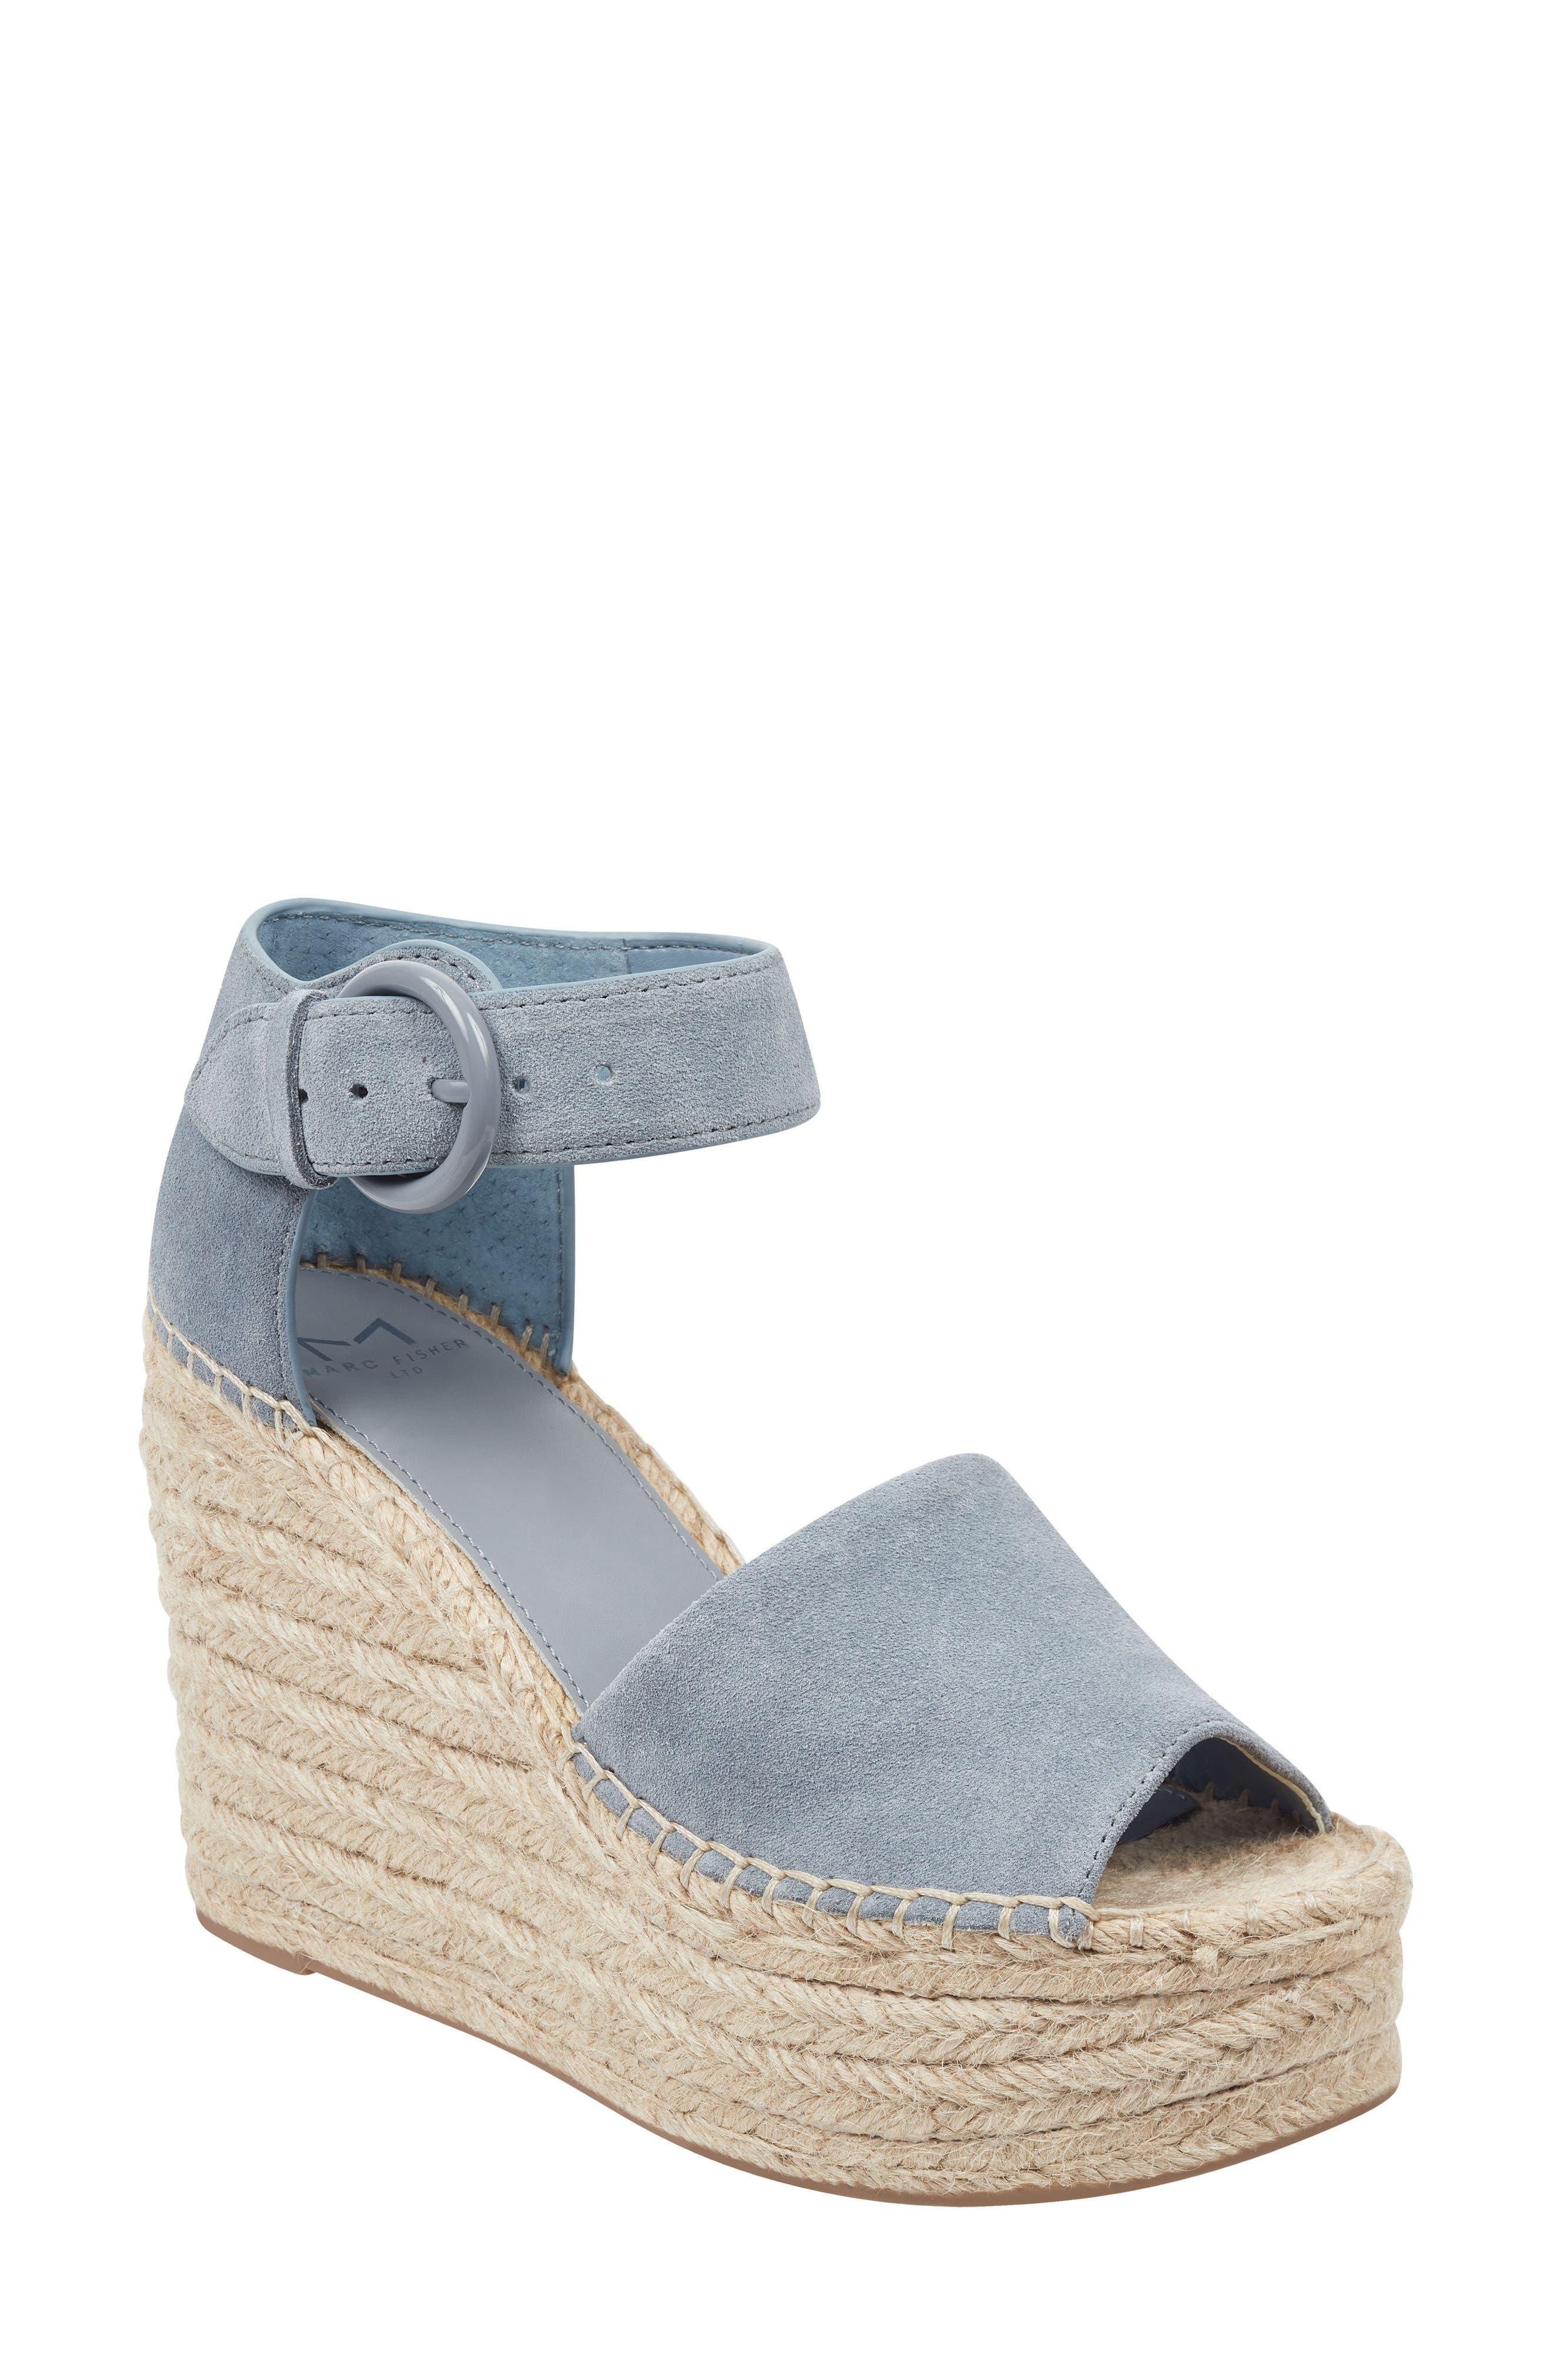 e018bc20e88 Marc Fisher LTD Ankle Strap Sandals for Women